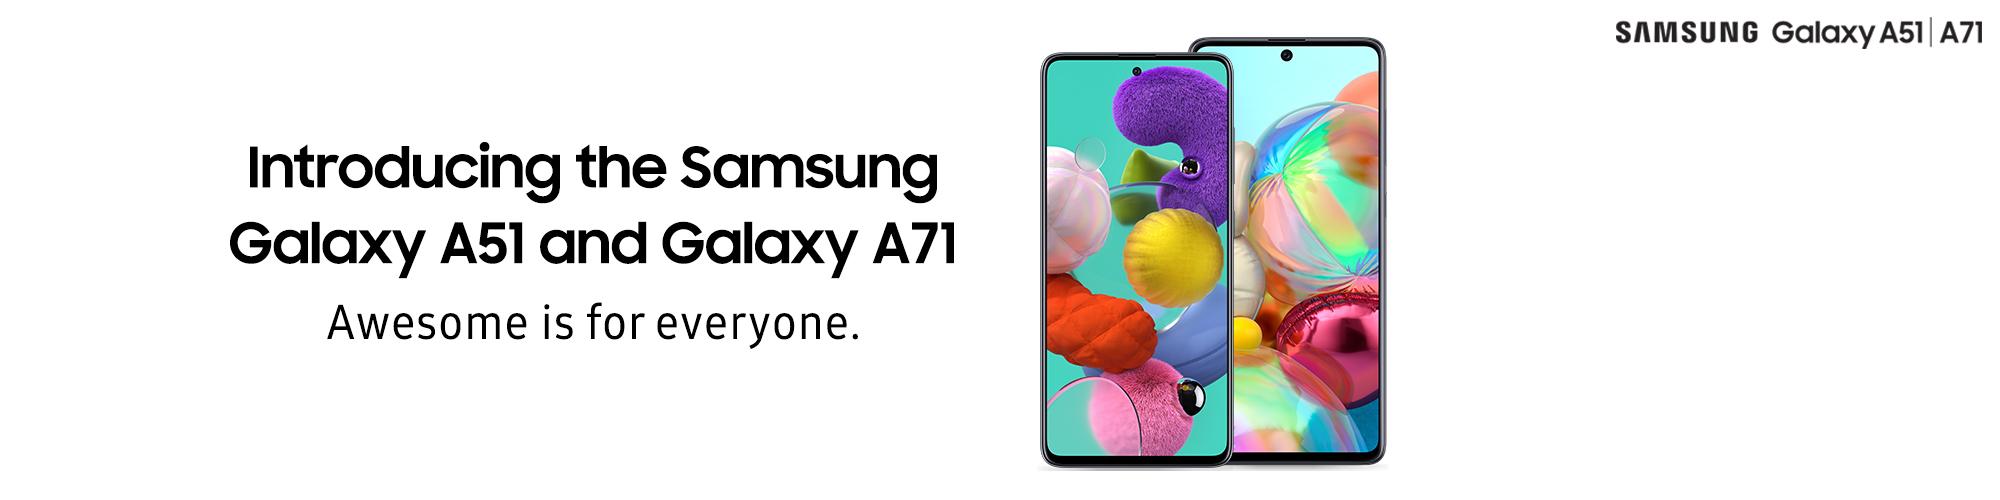 Samsung Galaxy A51|A71